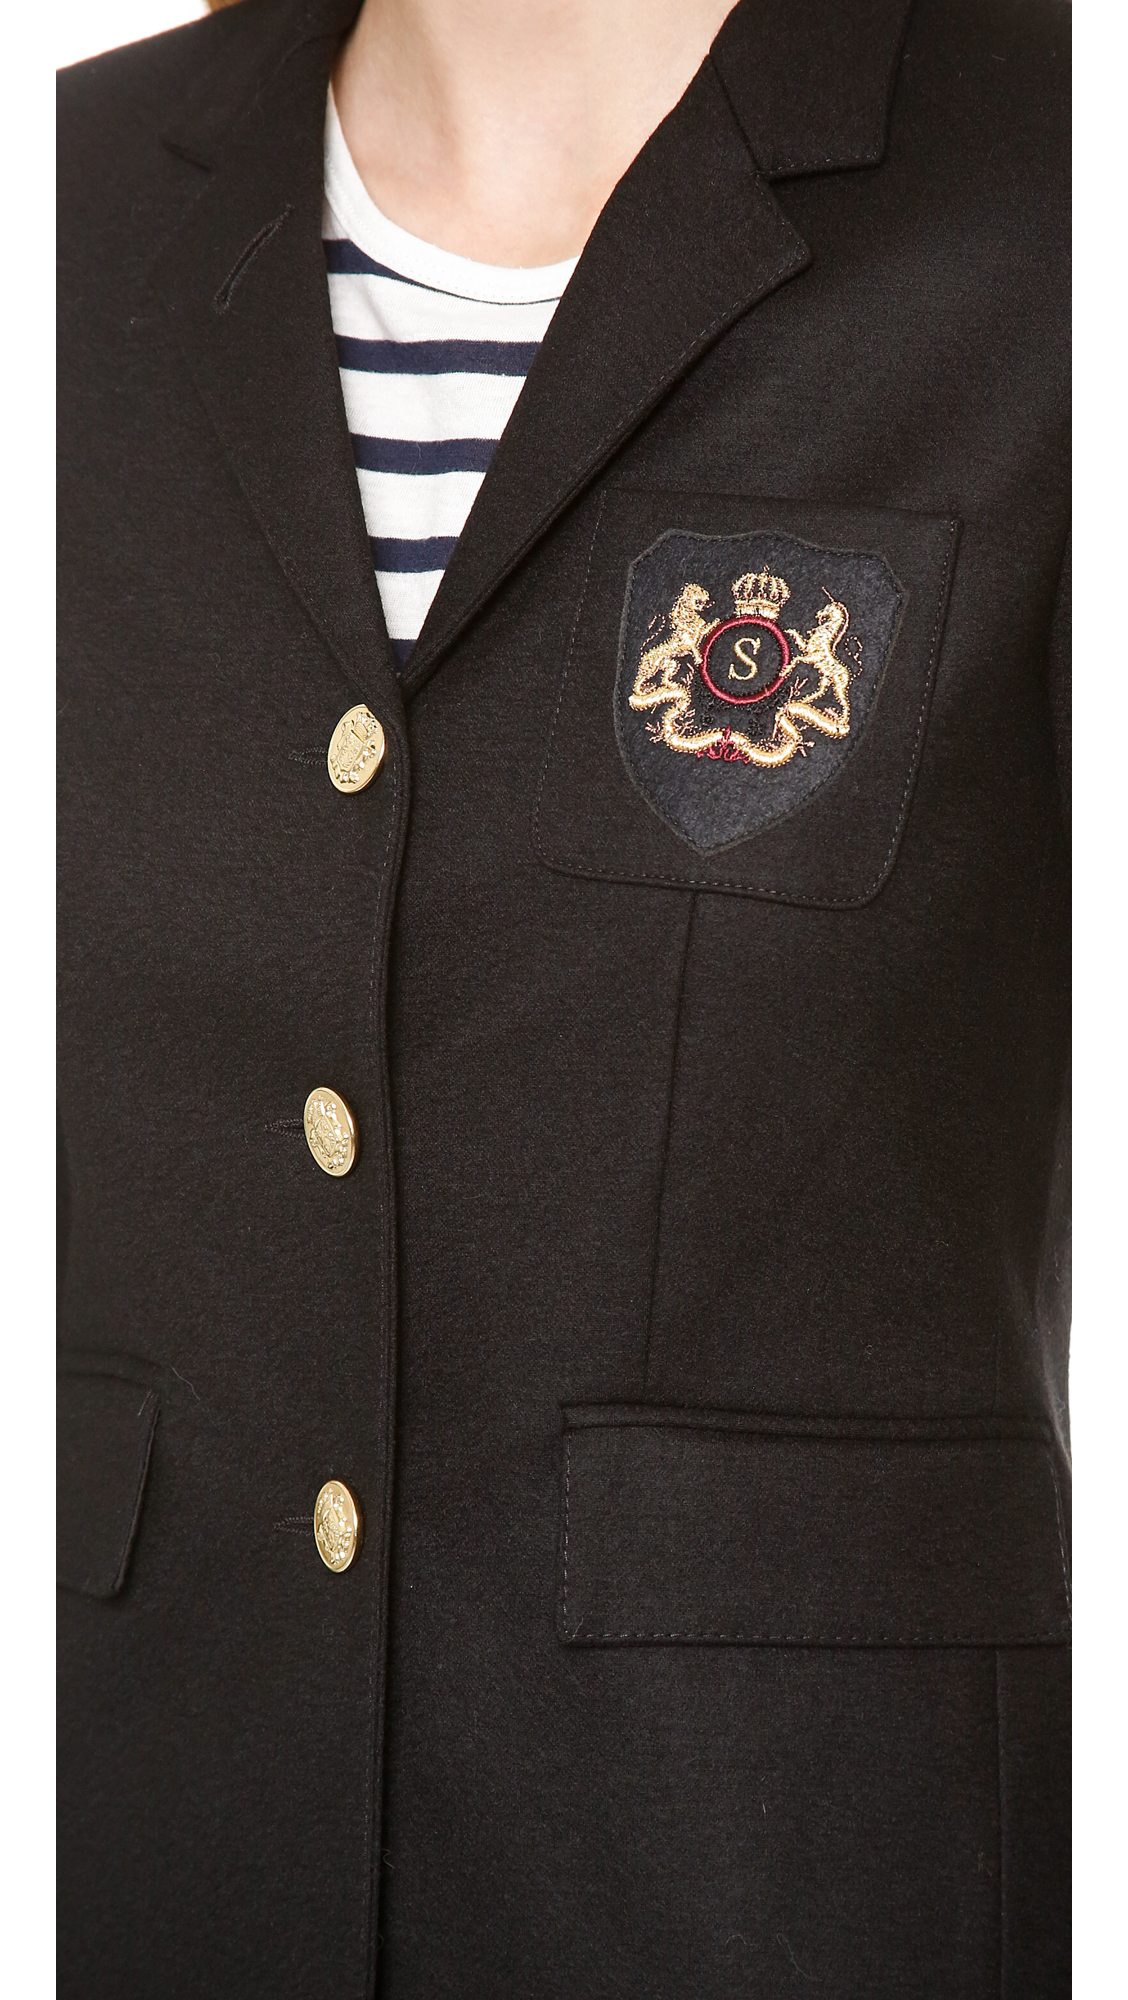 Smythe three button schoolboy blazer